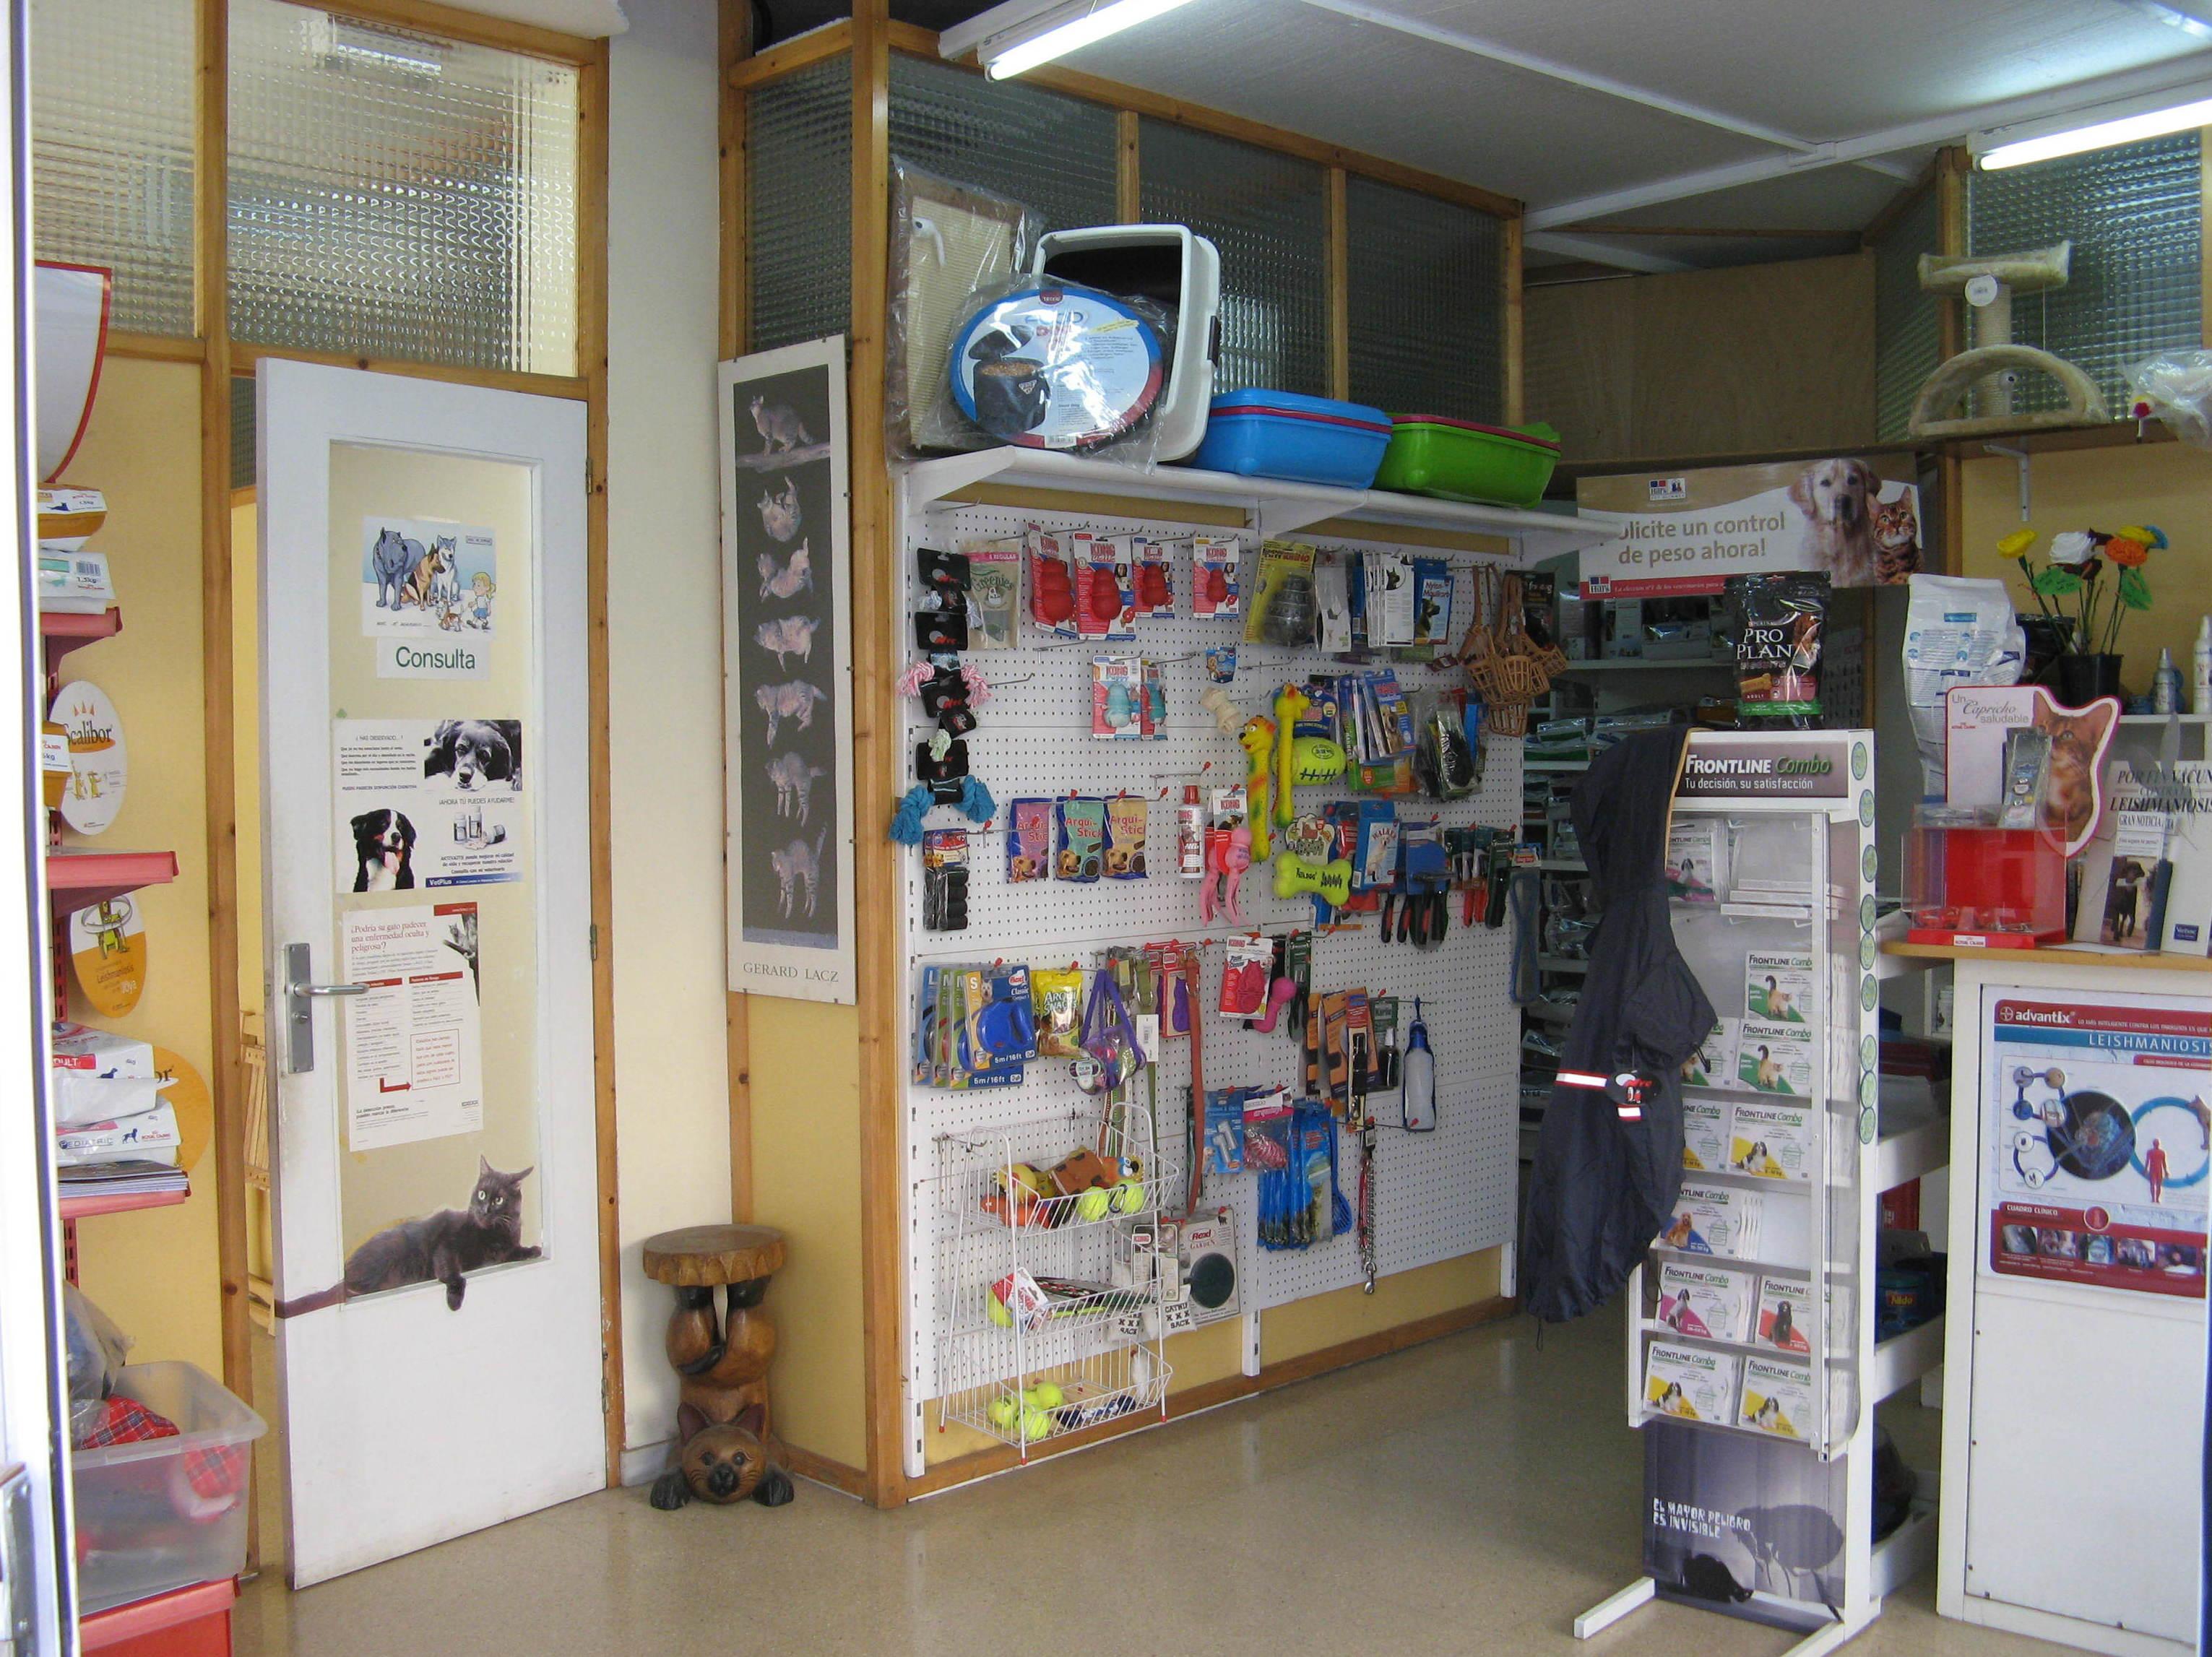 Foto 8 de Clínica veterinaria en Sabadell | Gos i Gat clínica veterinària sl